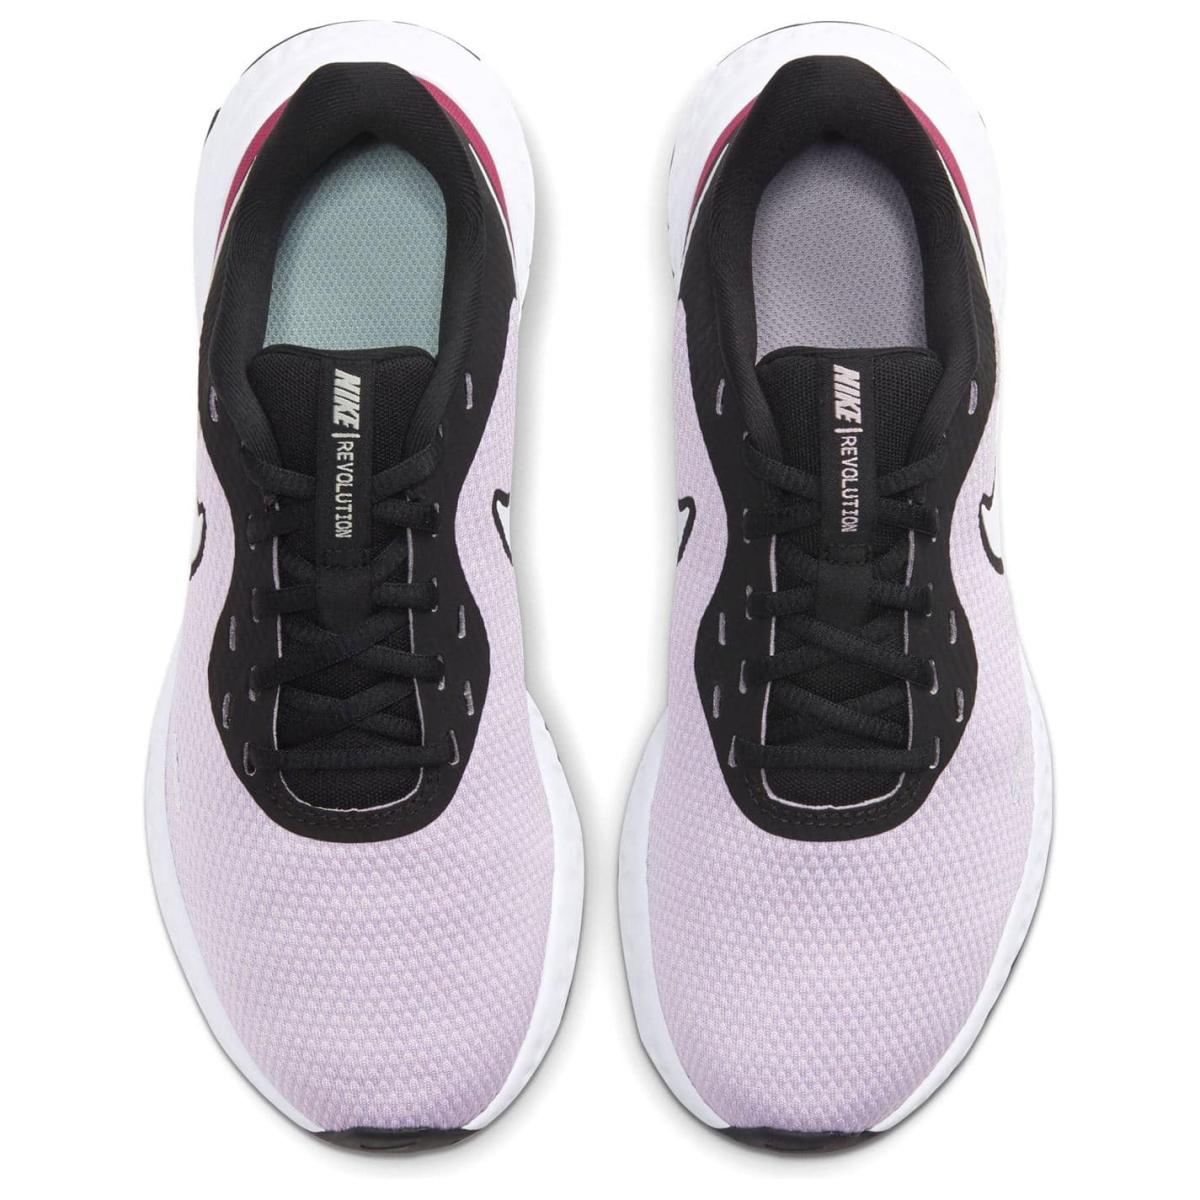 Nike-Revolution-Turnschuhe-Damen-Sneaker-Sportschuhe-Laufschuhe-1160 Indexbild 40